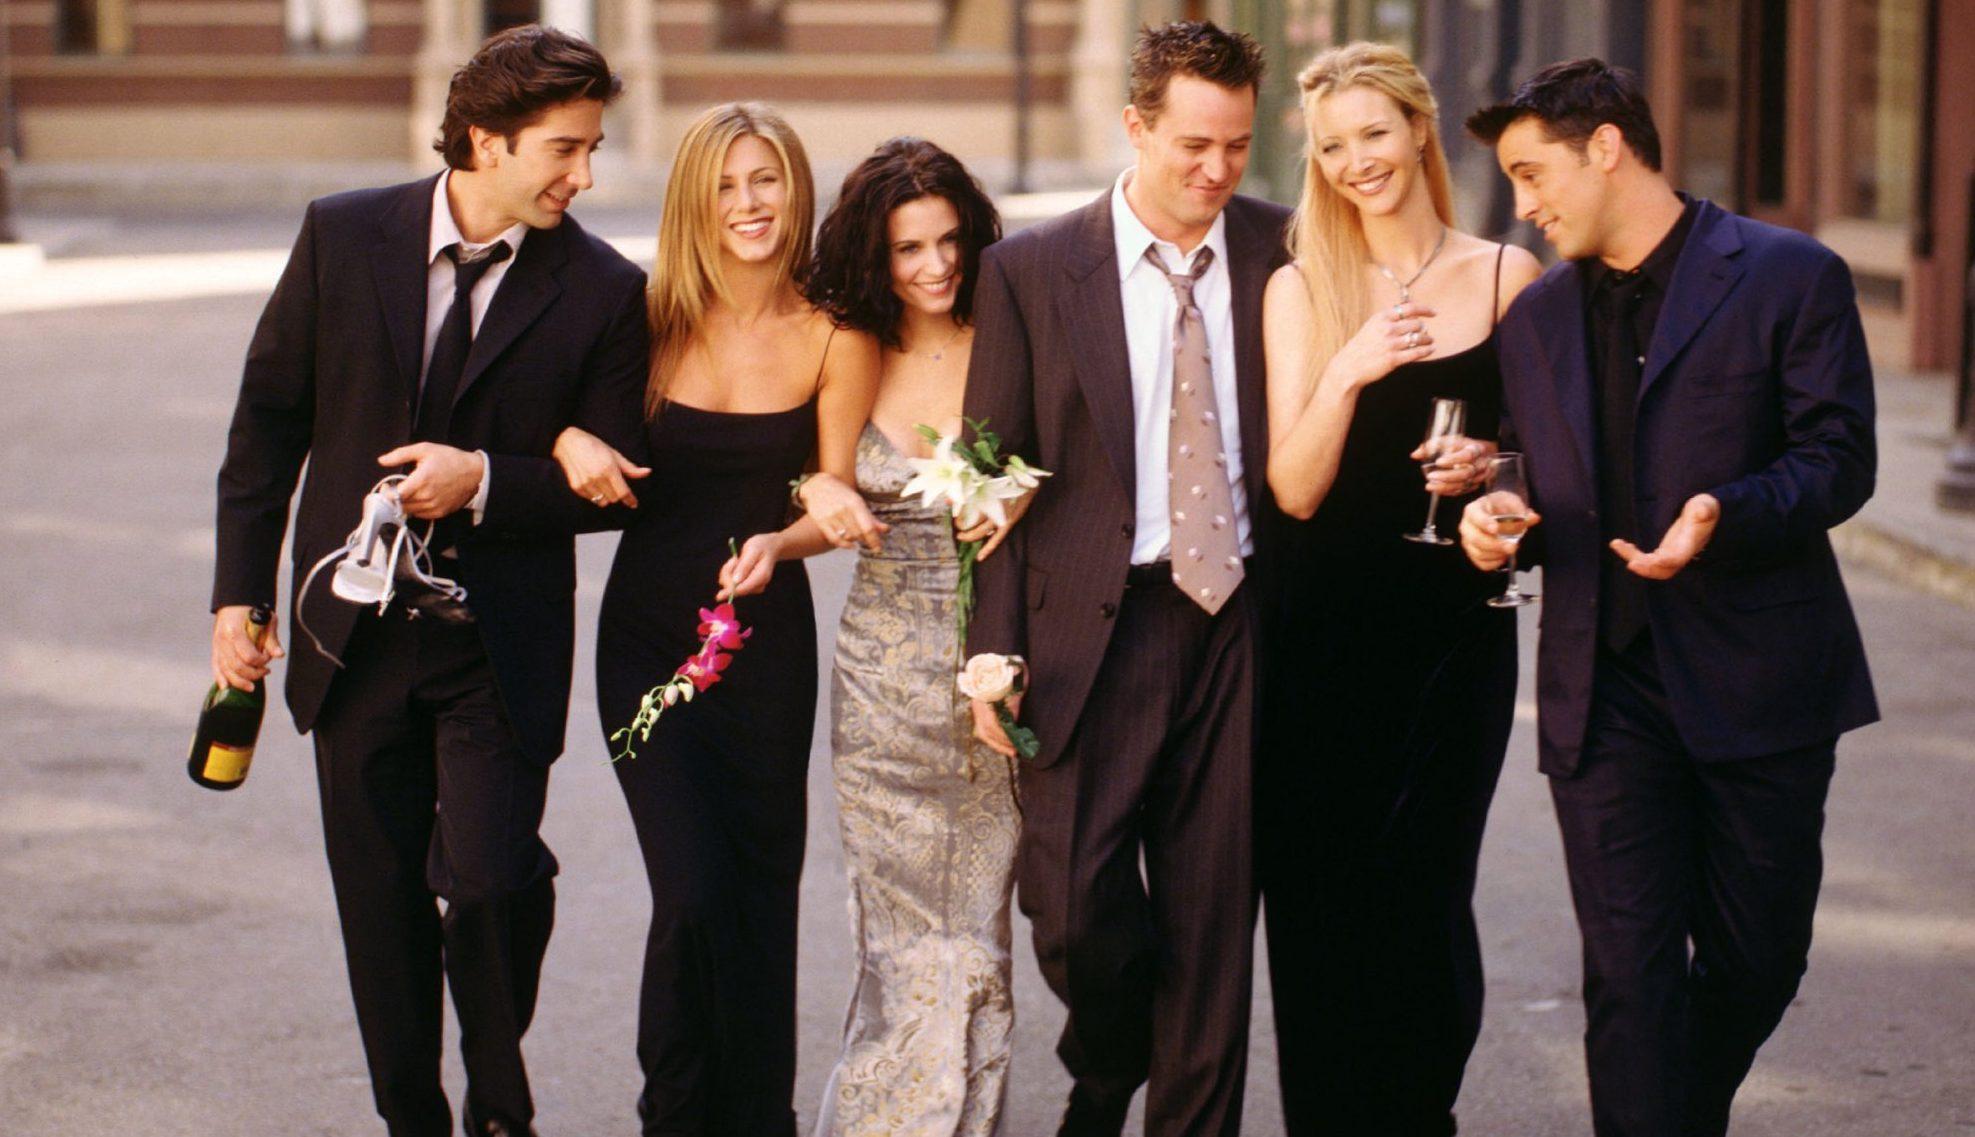 Friends cast including David Schwimmer